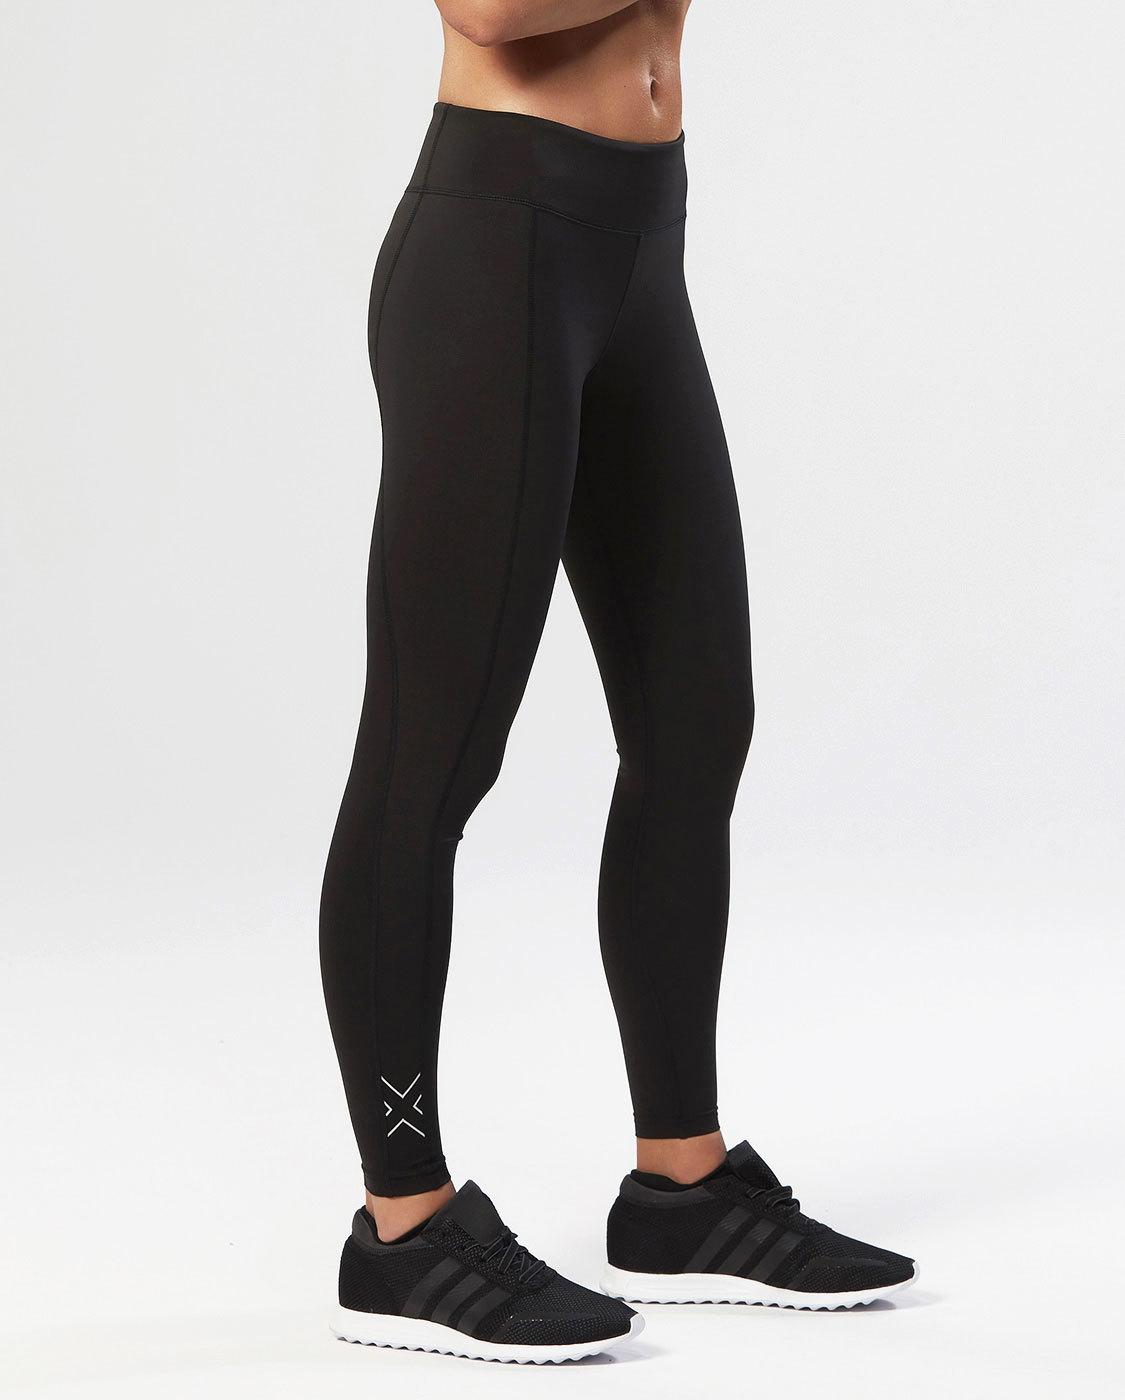 2XU Women's Fitness Compression Tights - Black/Silver